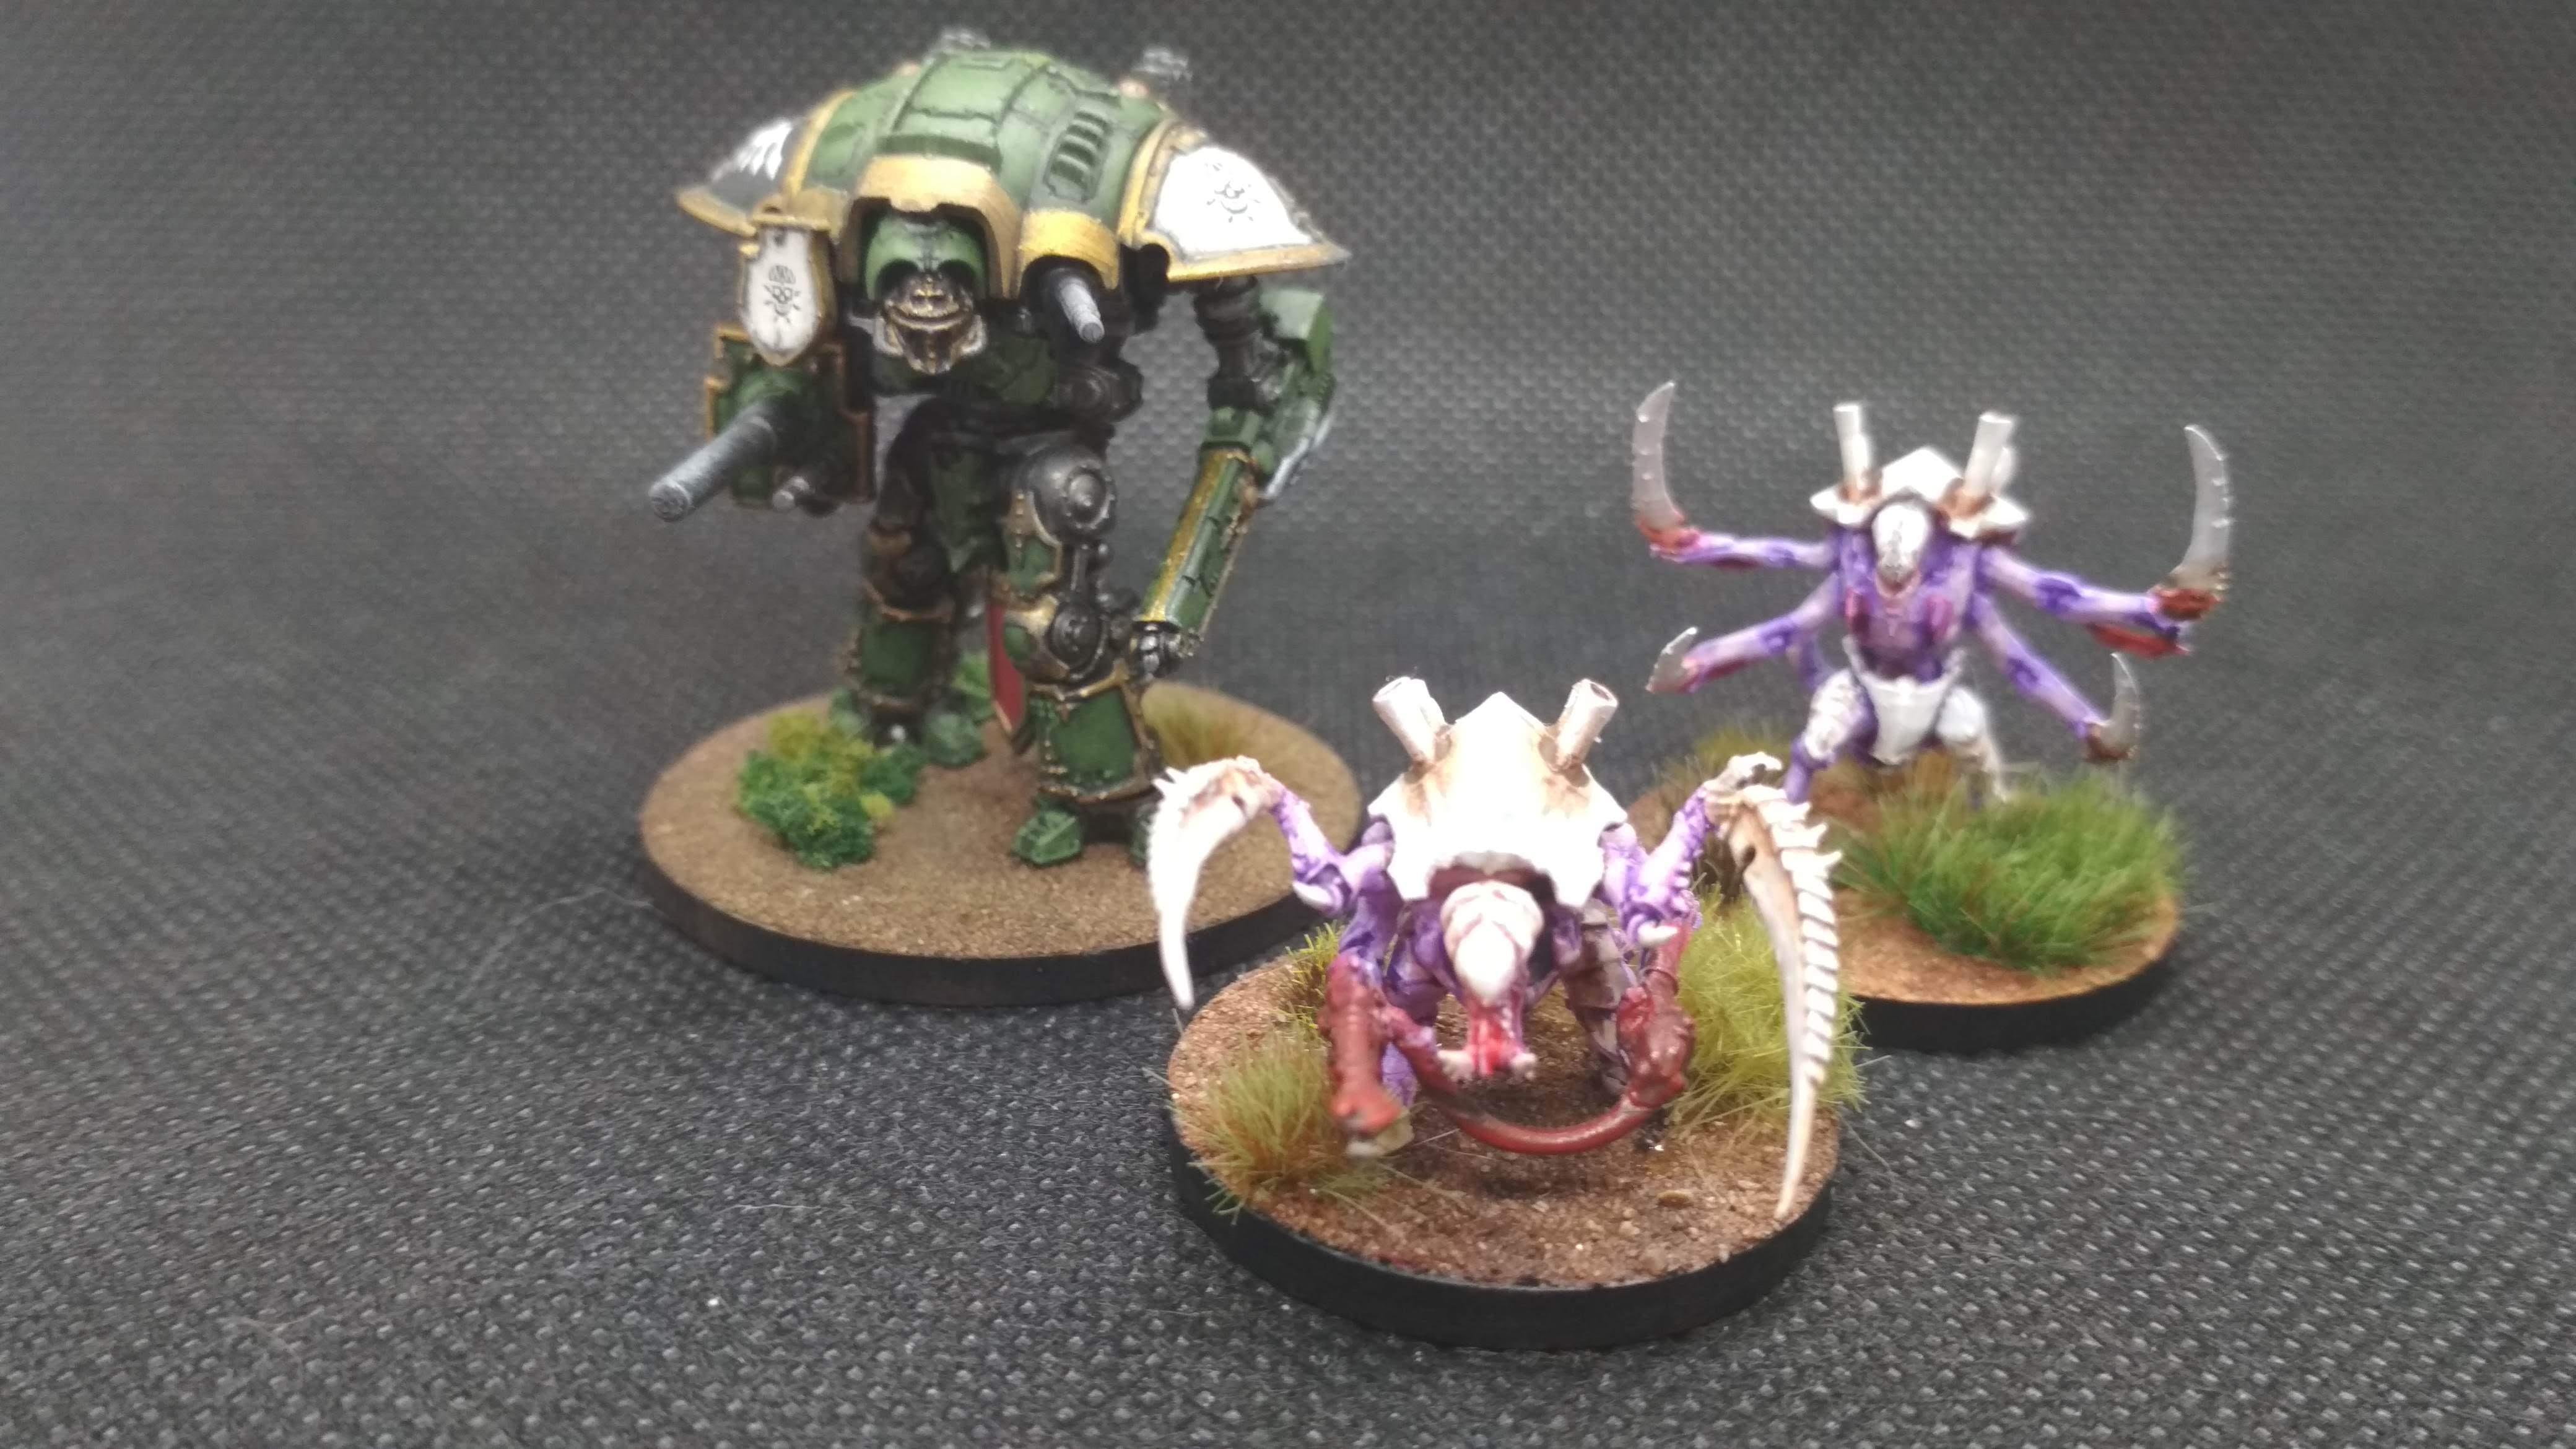 Adeptus titanicus carnifex hive tyrant imperial knight comparison